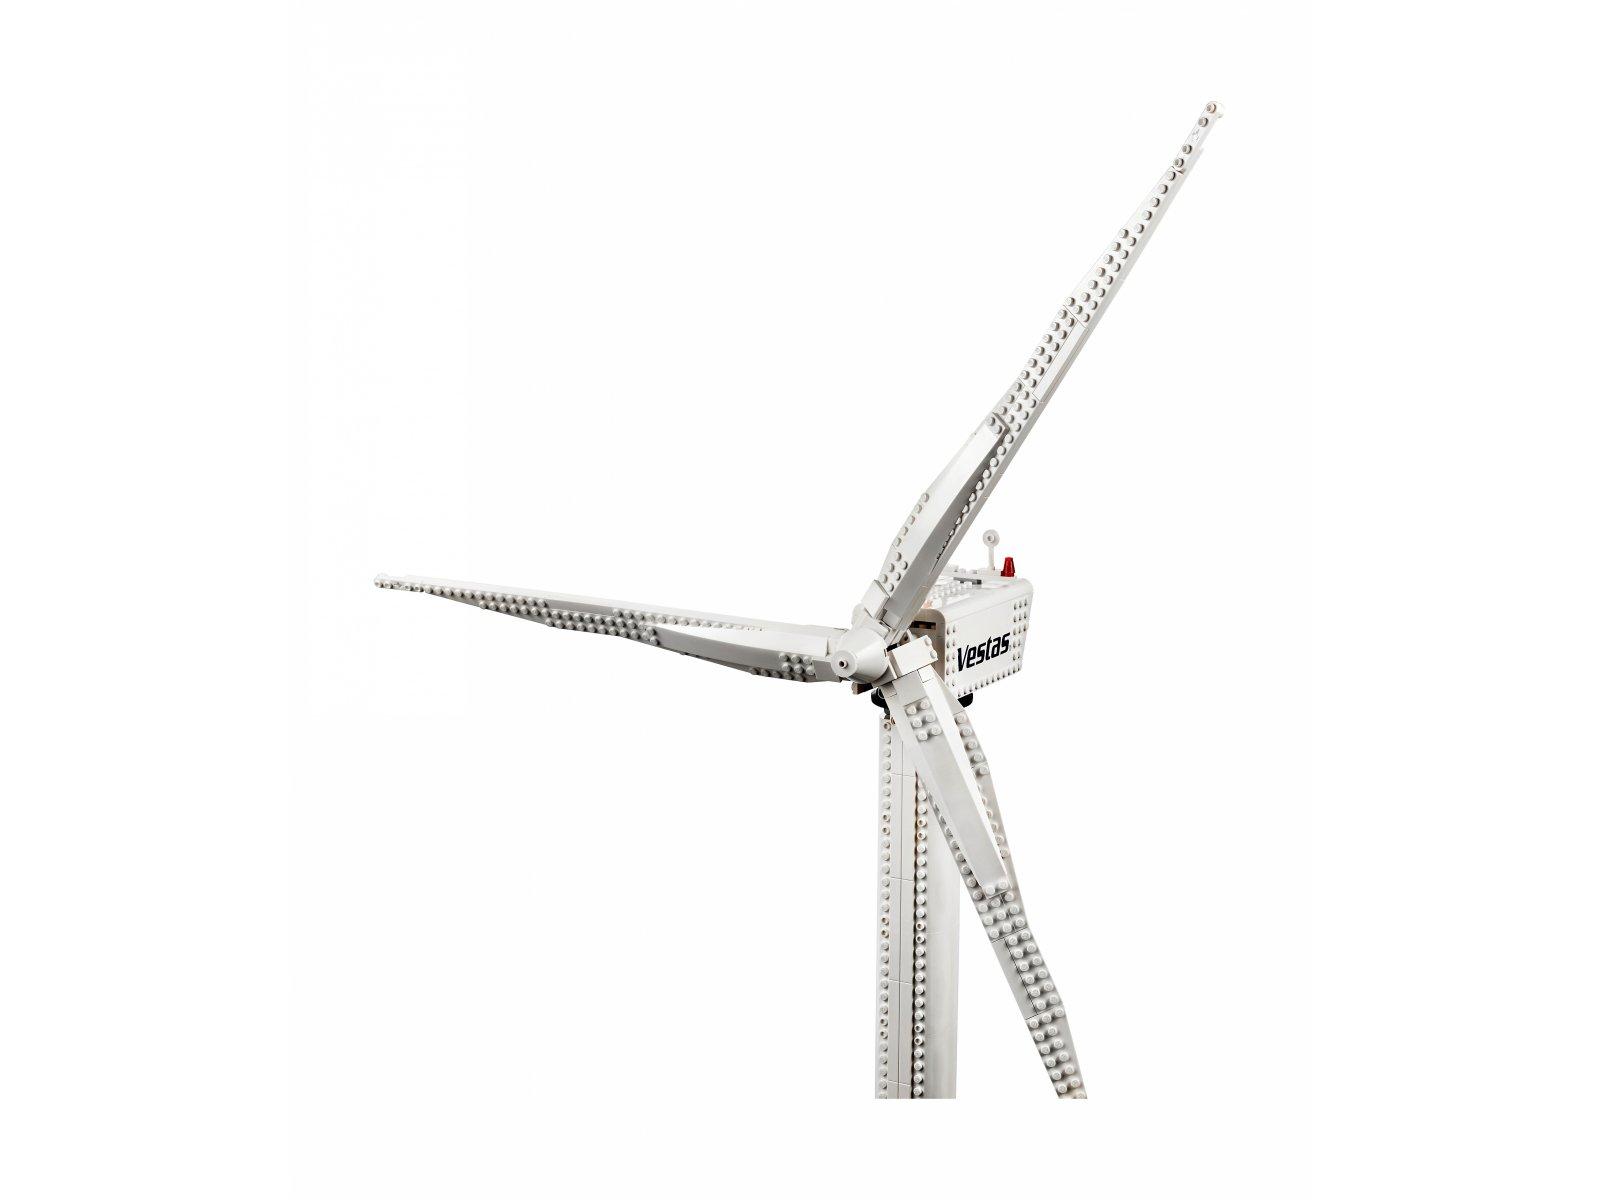 LEGO Creator Expert Turbina wiatrowa Vestas 10268